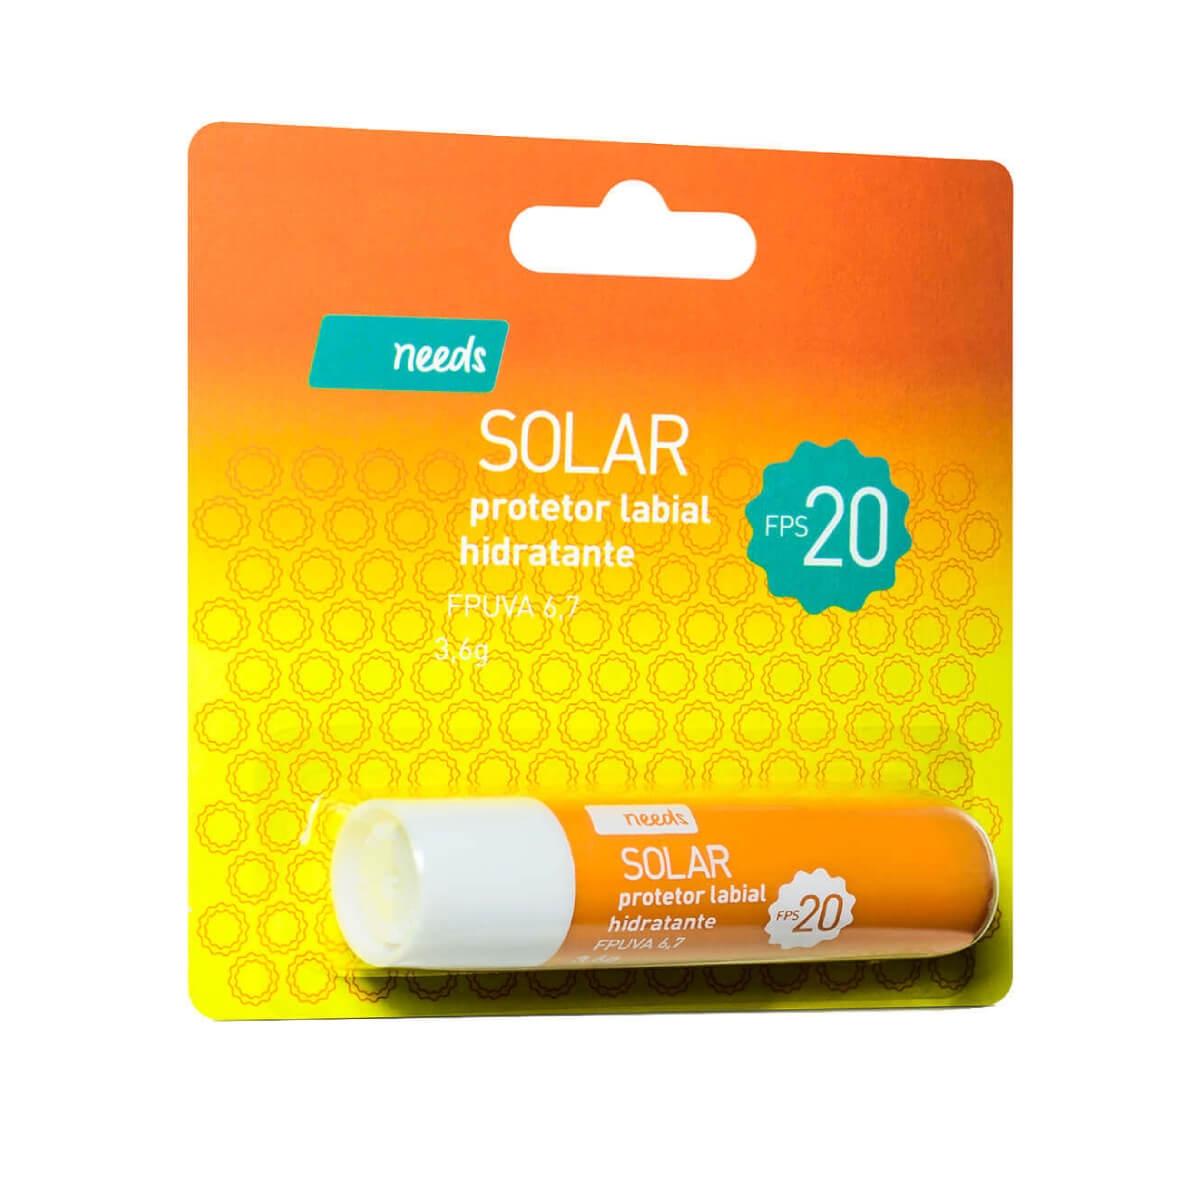 Solar Protetor Labial Needs Hidratante FPS20 3,6g